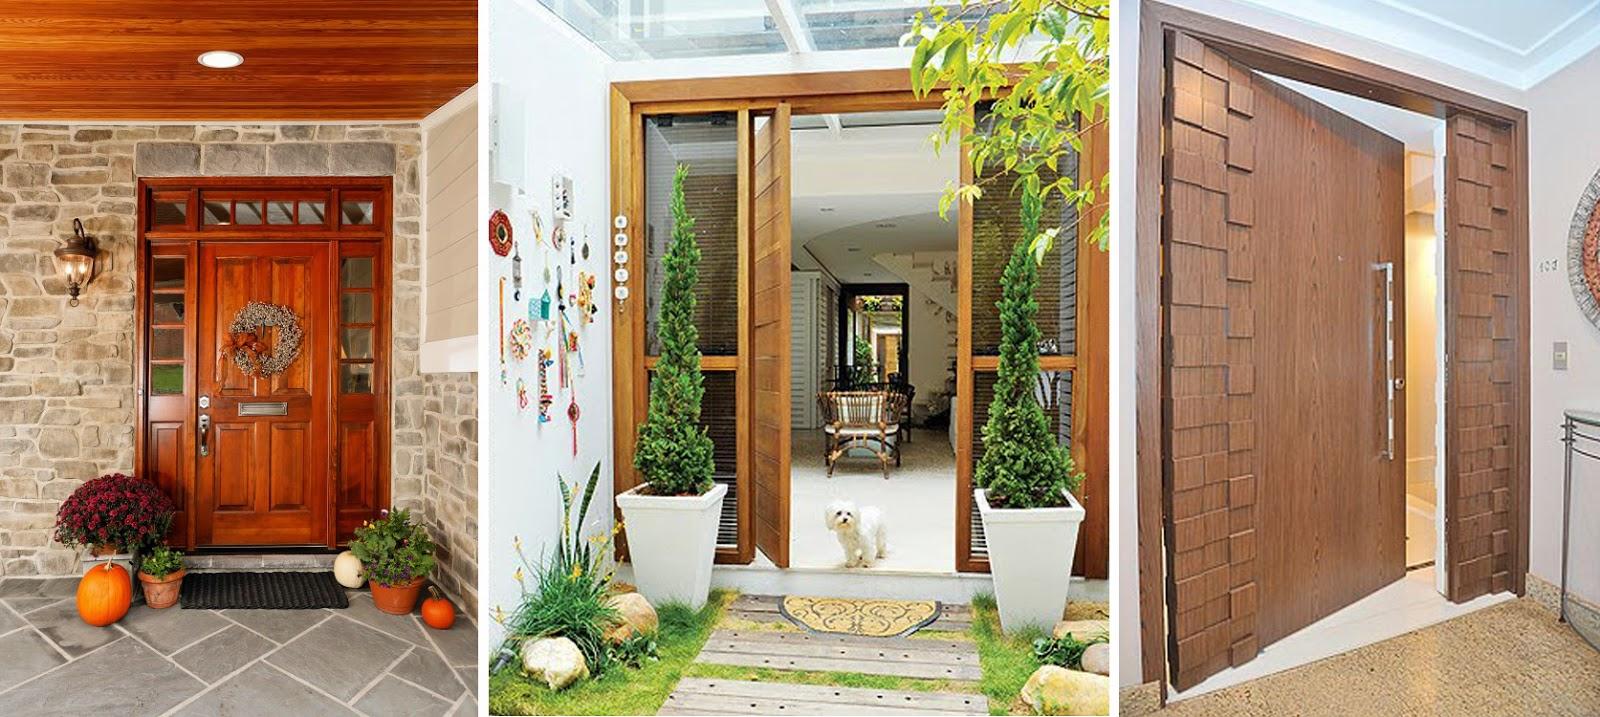 Blog corporativo construtora lfurtado for Entrada de un piso feng shui